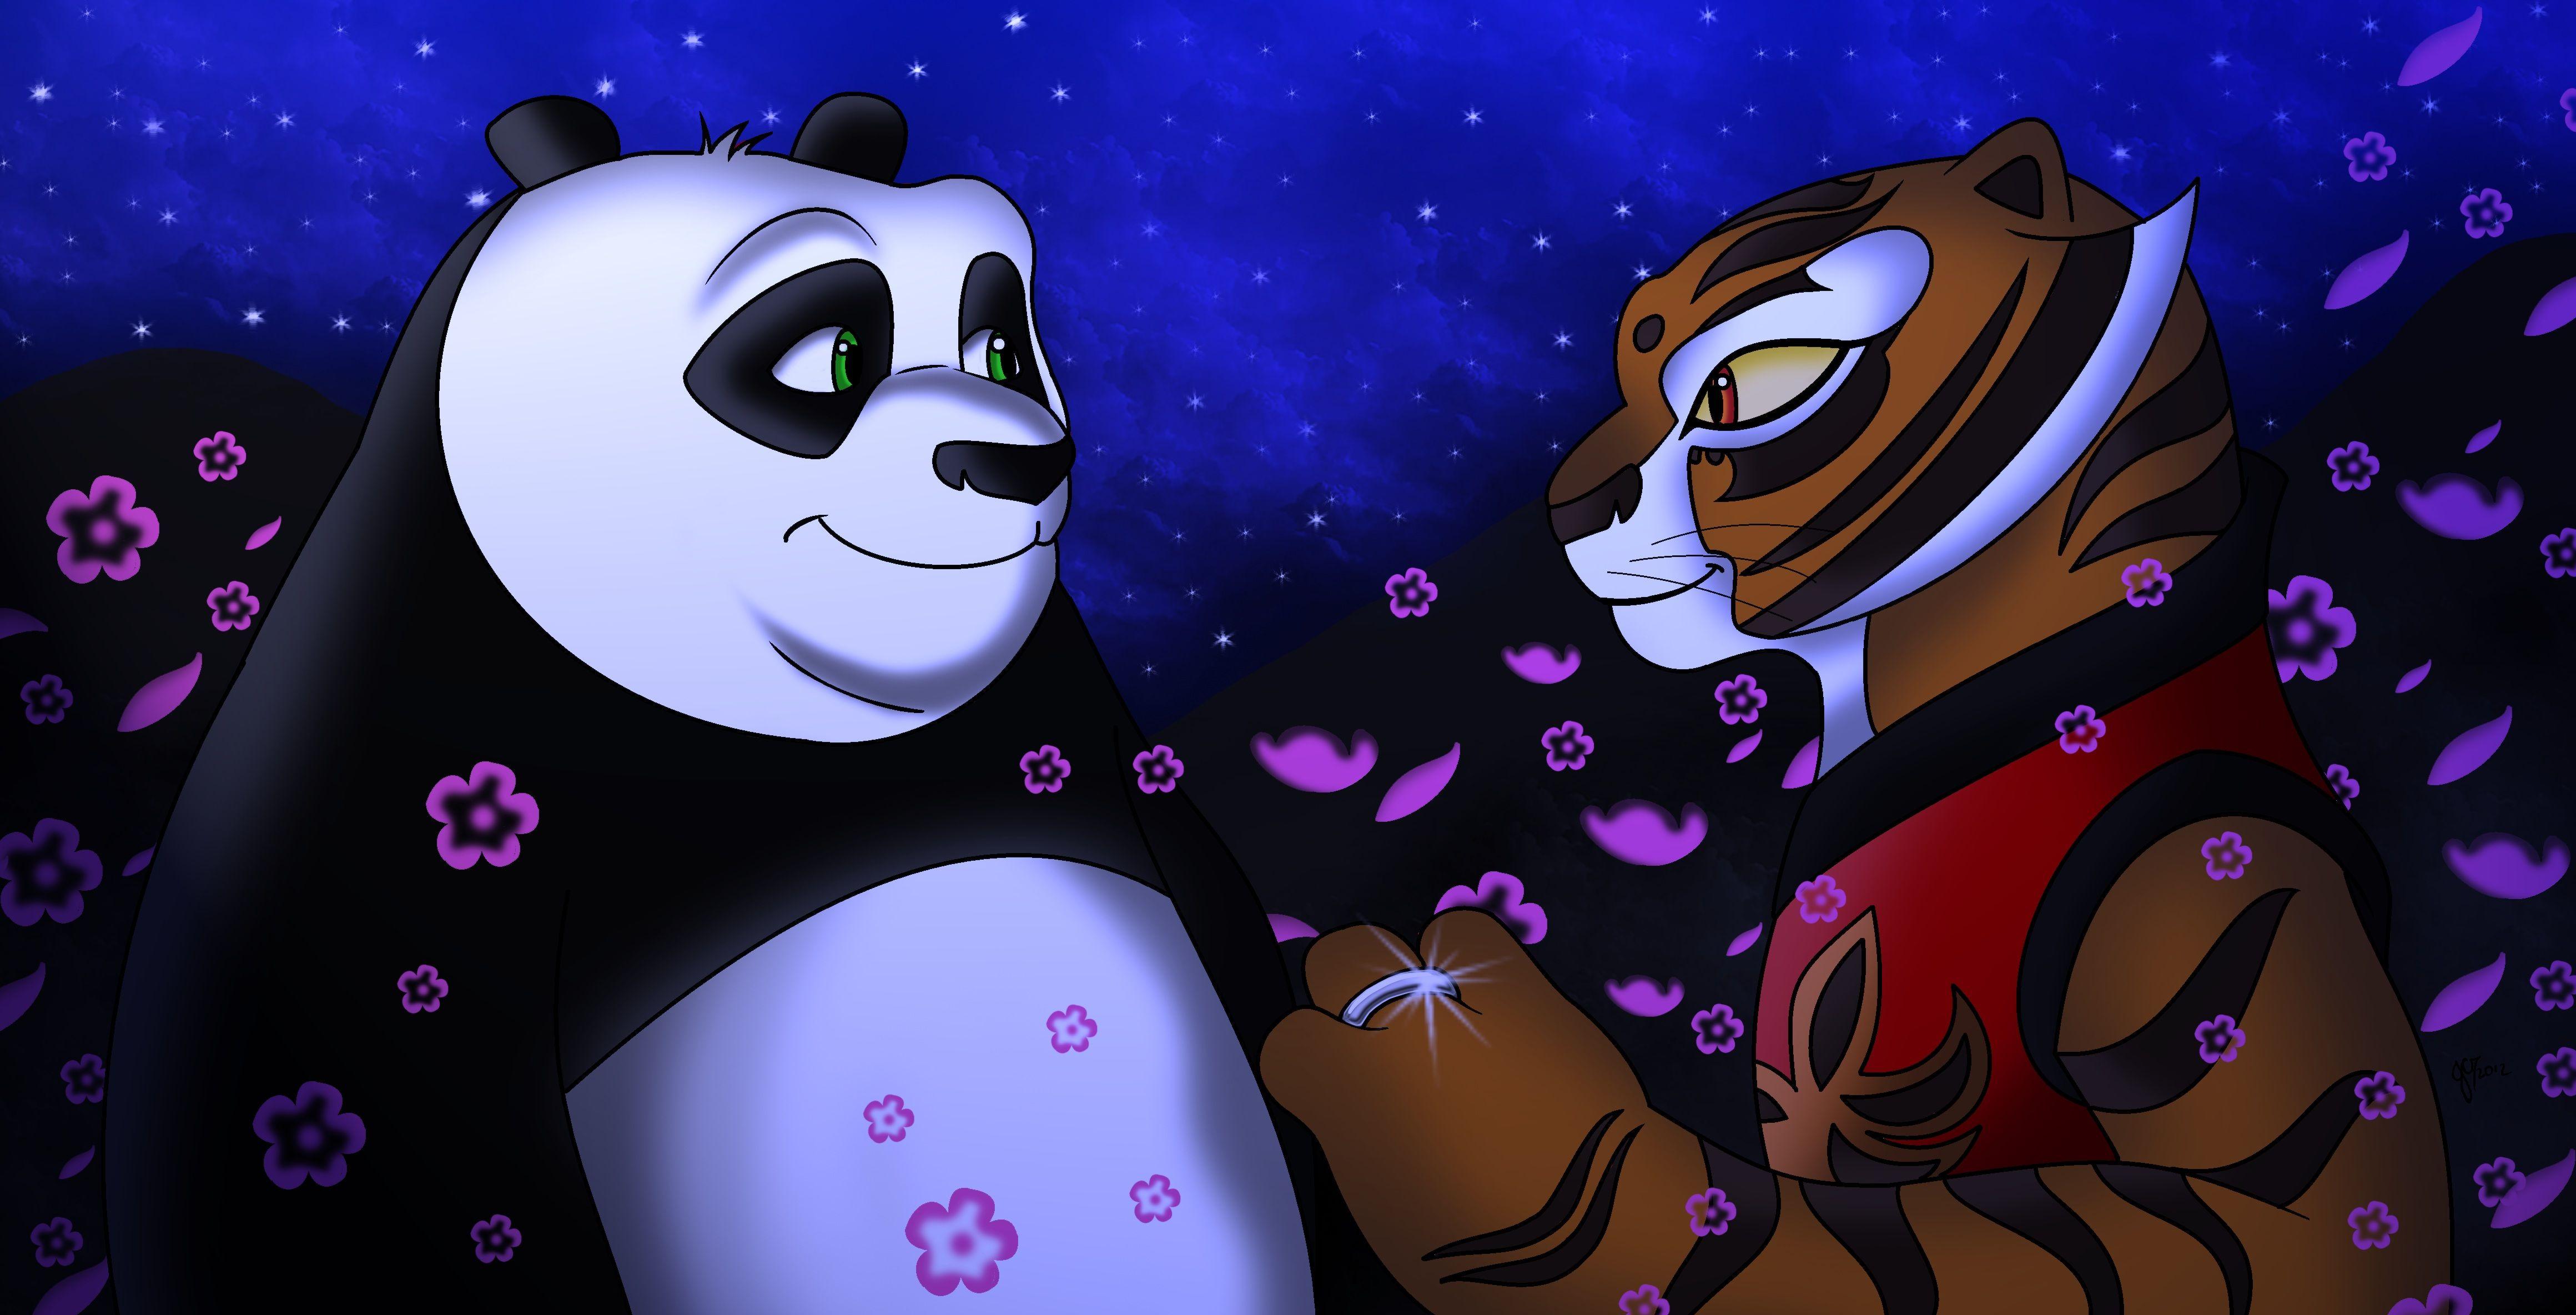 Po and Tigress by Taylor-Denna on DeviantArt